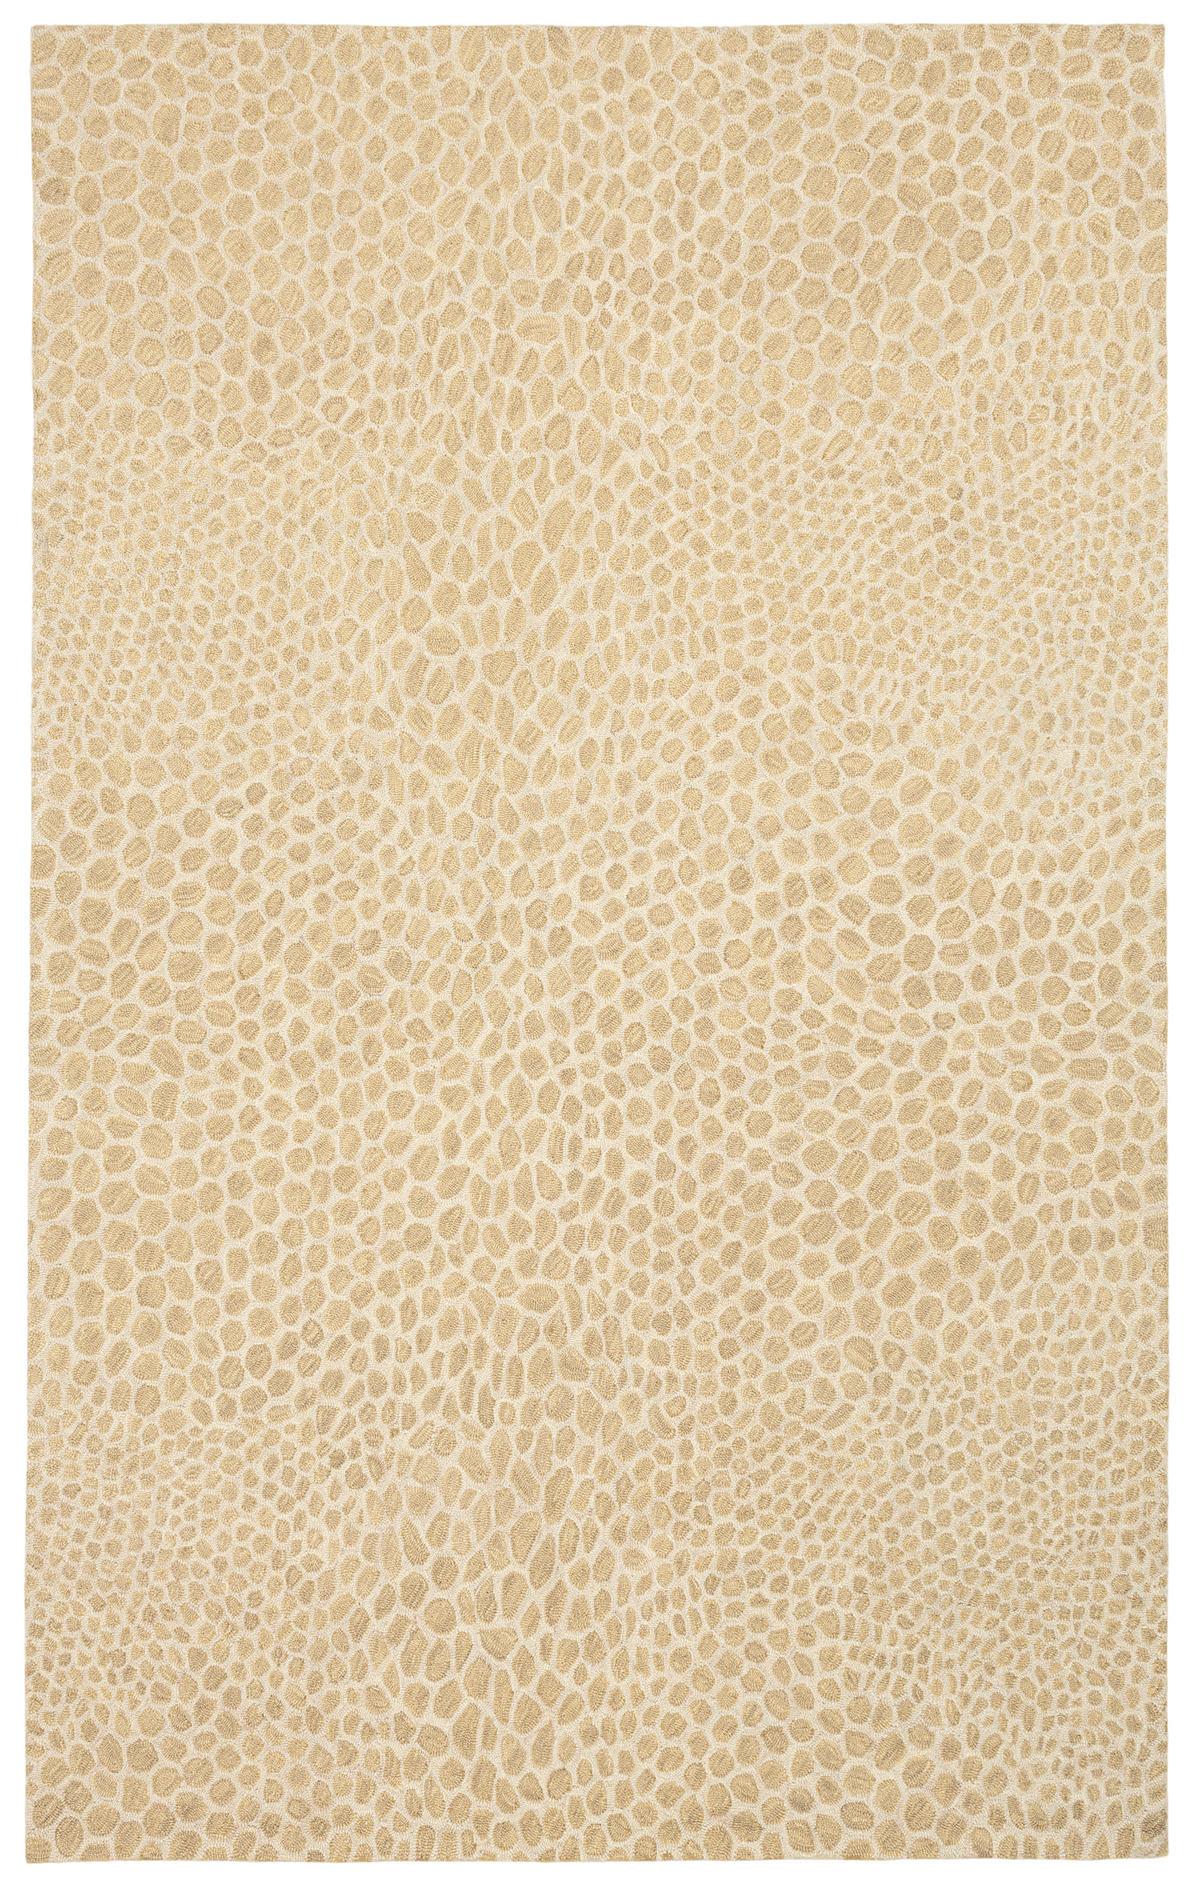 Anya Micro Hooked Wool Rug